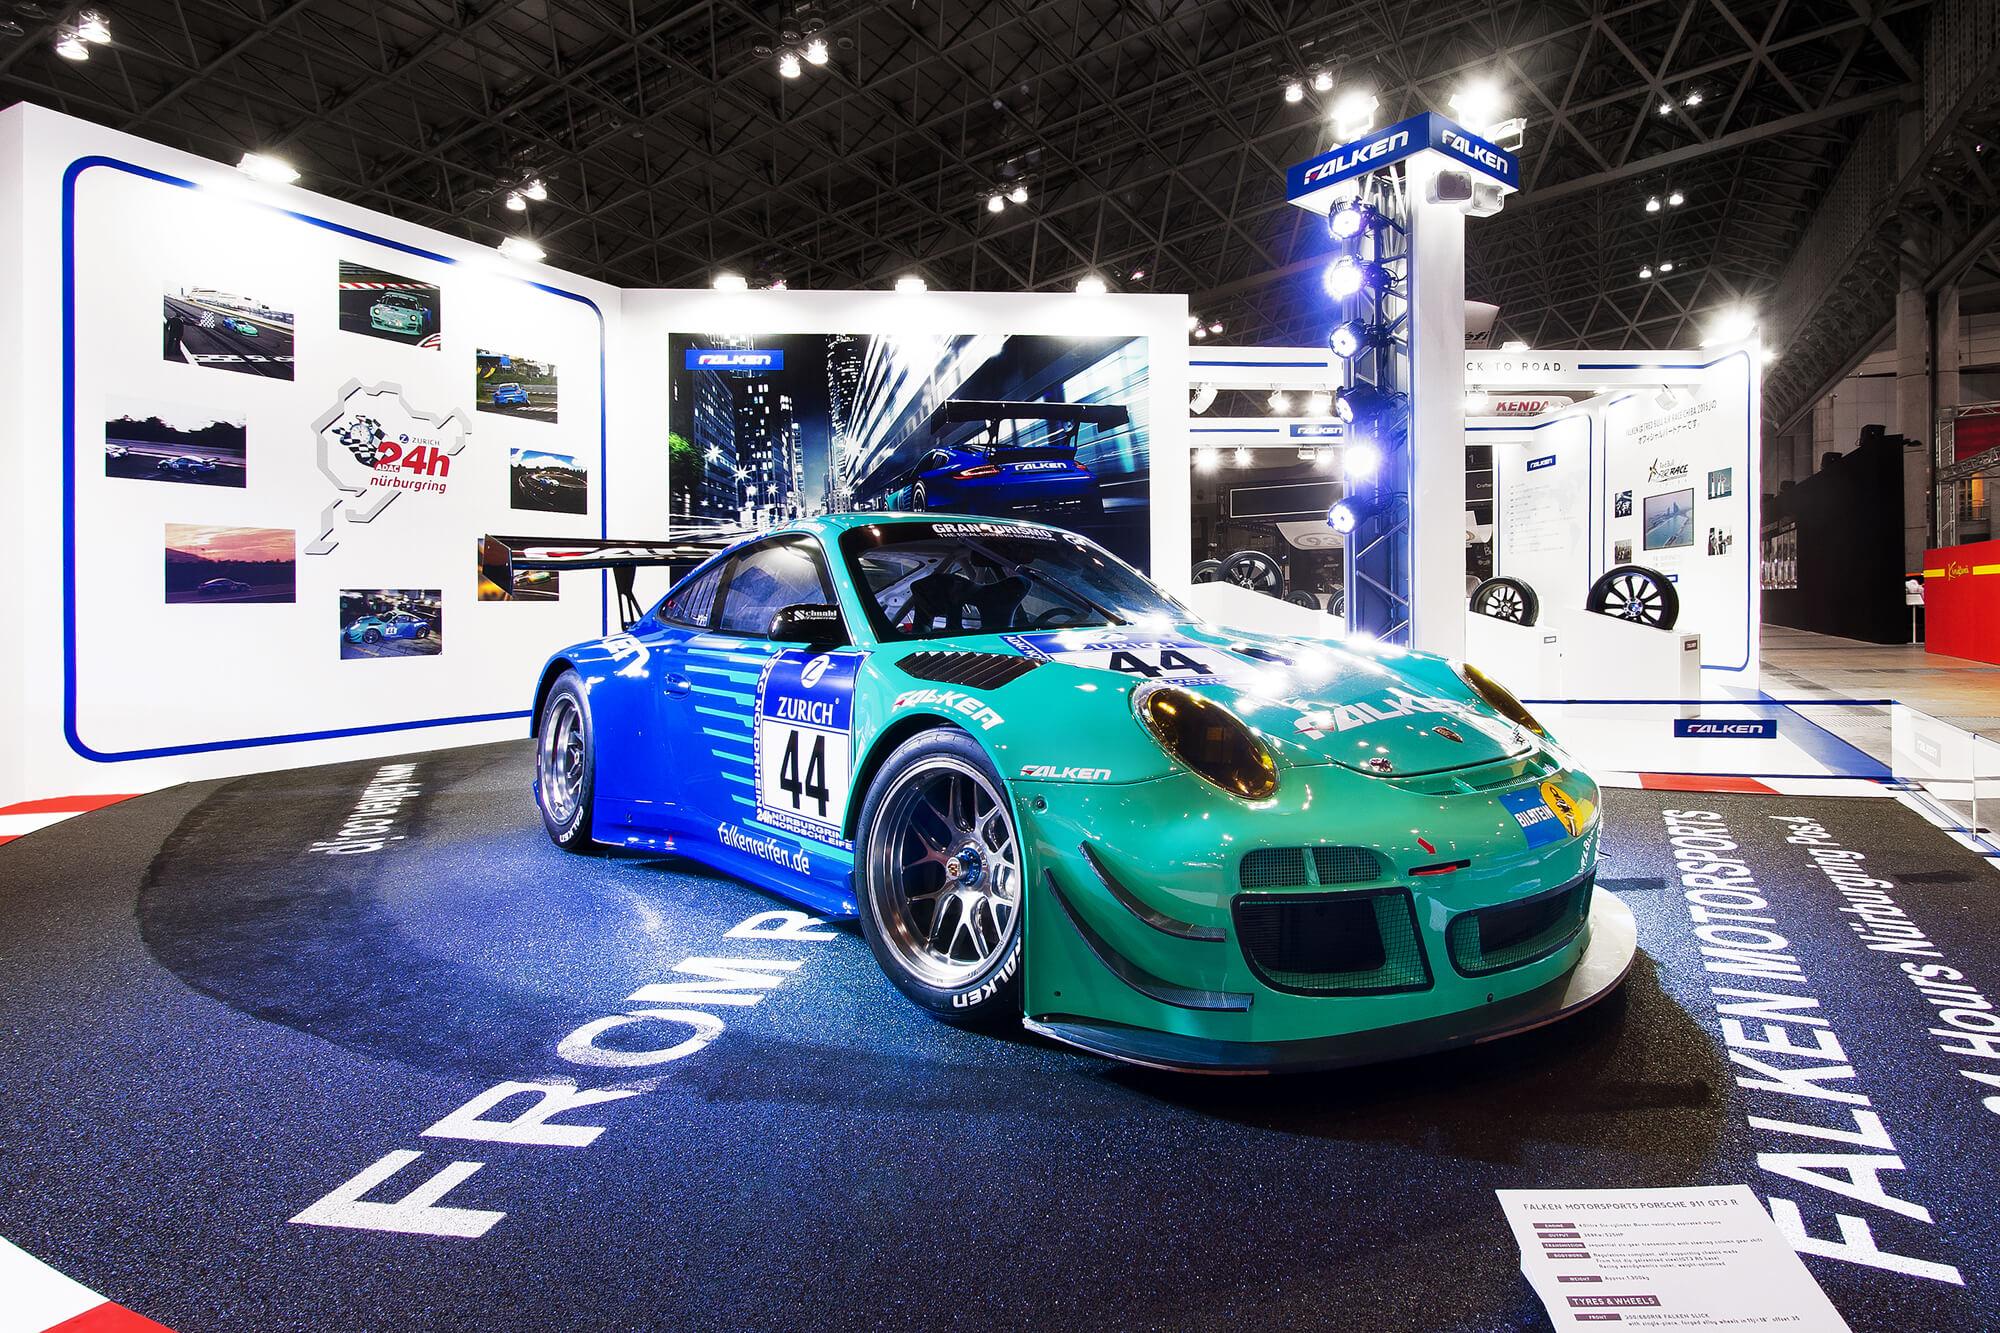 Tokyo auto salon 2015 falken booth kuroko inc - Tokyo auto salon 2015 ...